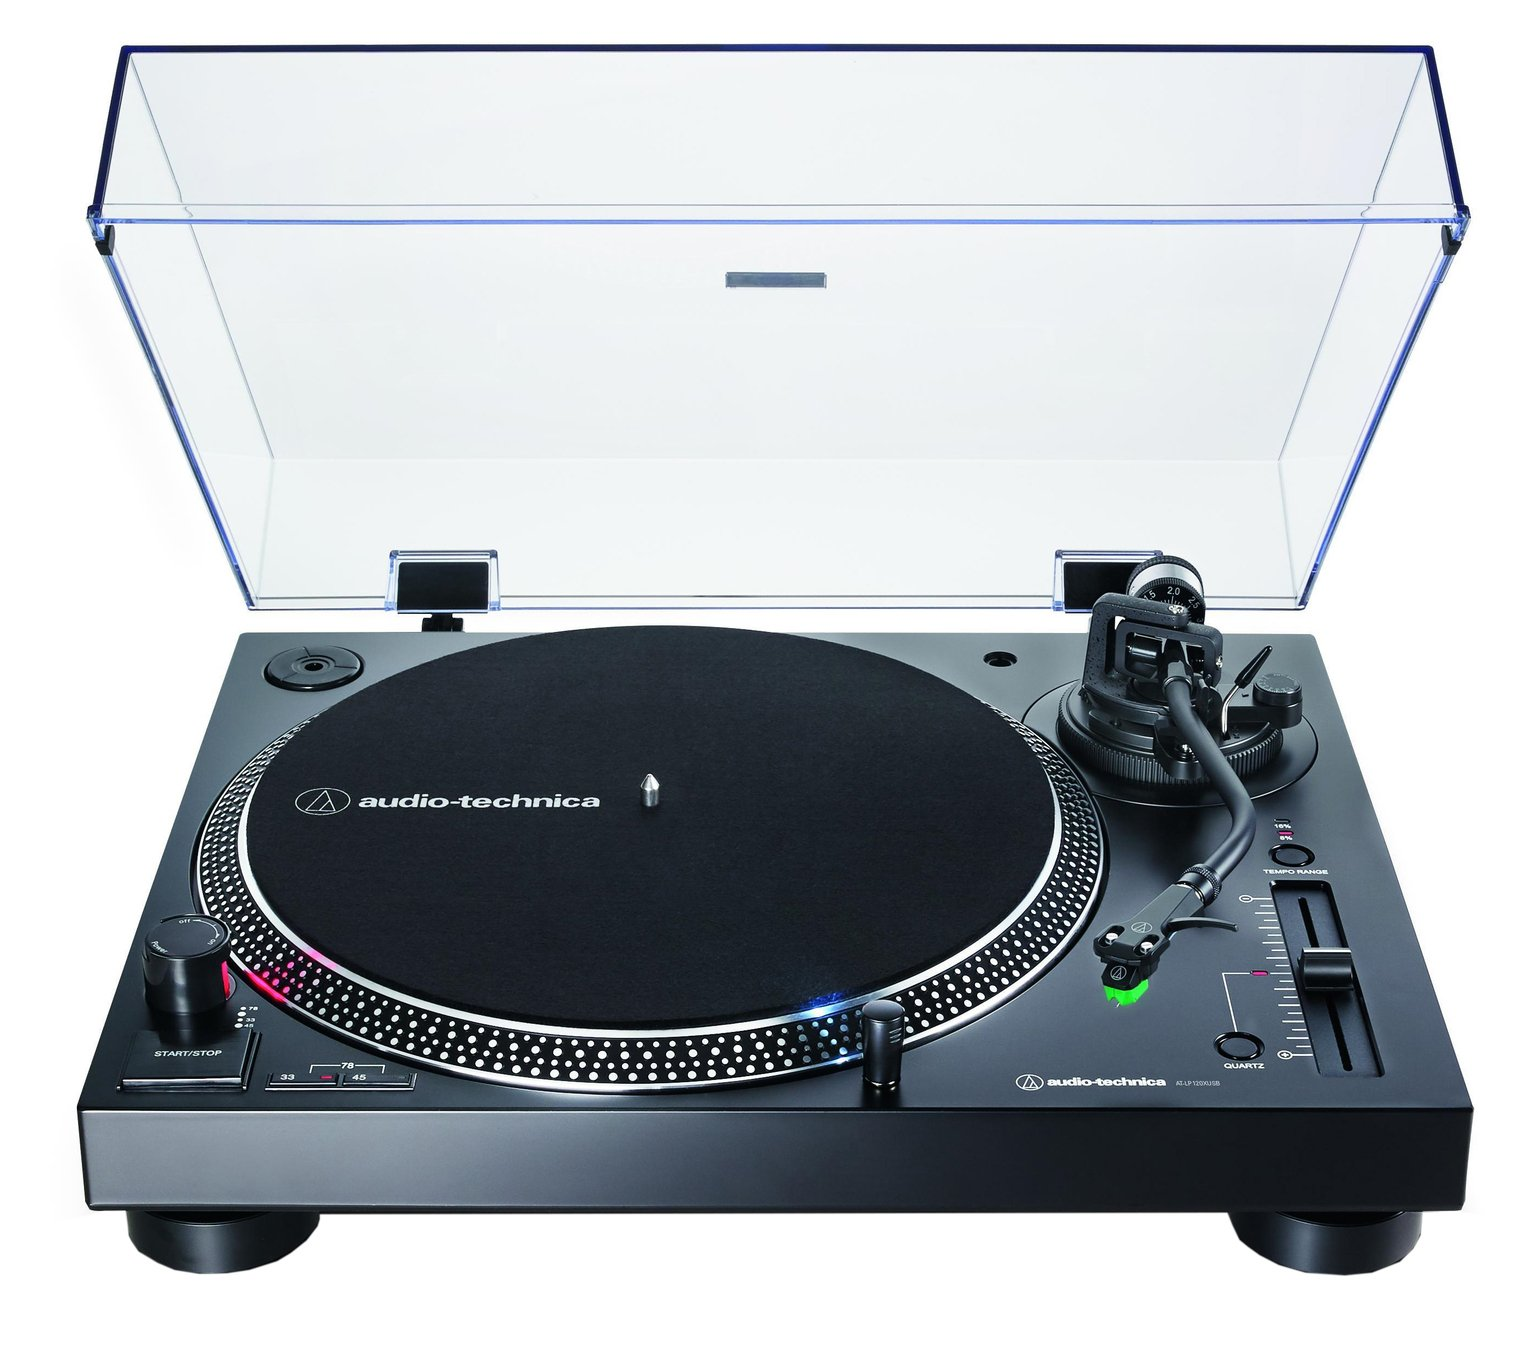 Audio-Technica AT-LP120XUSBBK Direct-Drive Turntable -Black